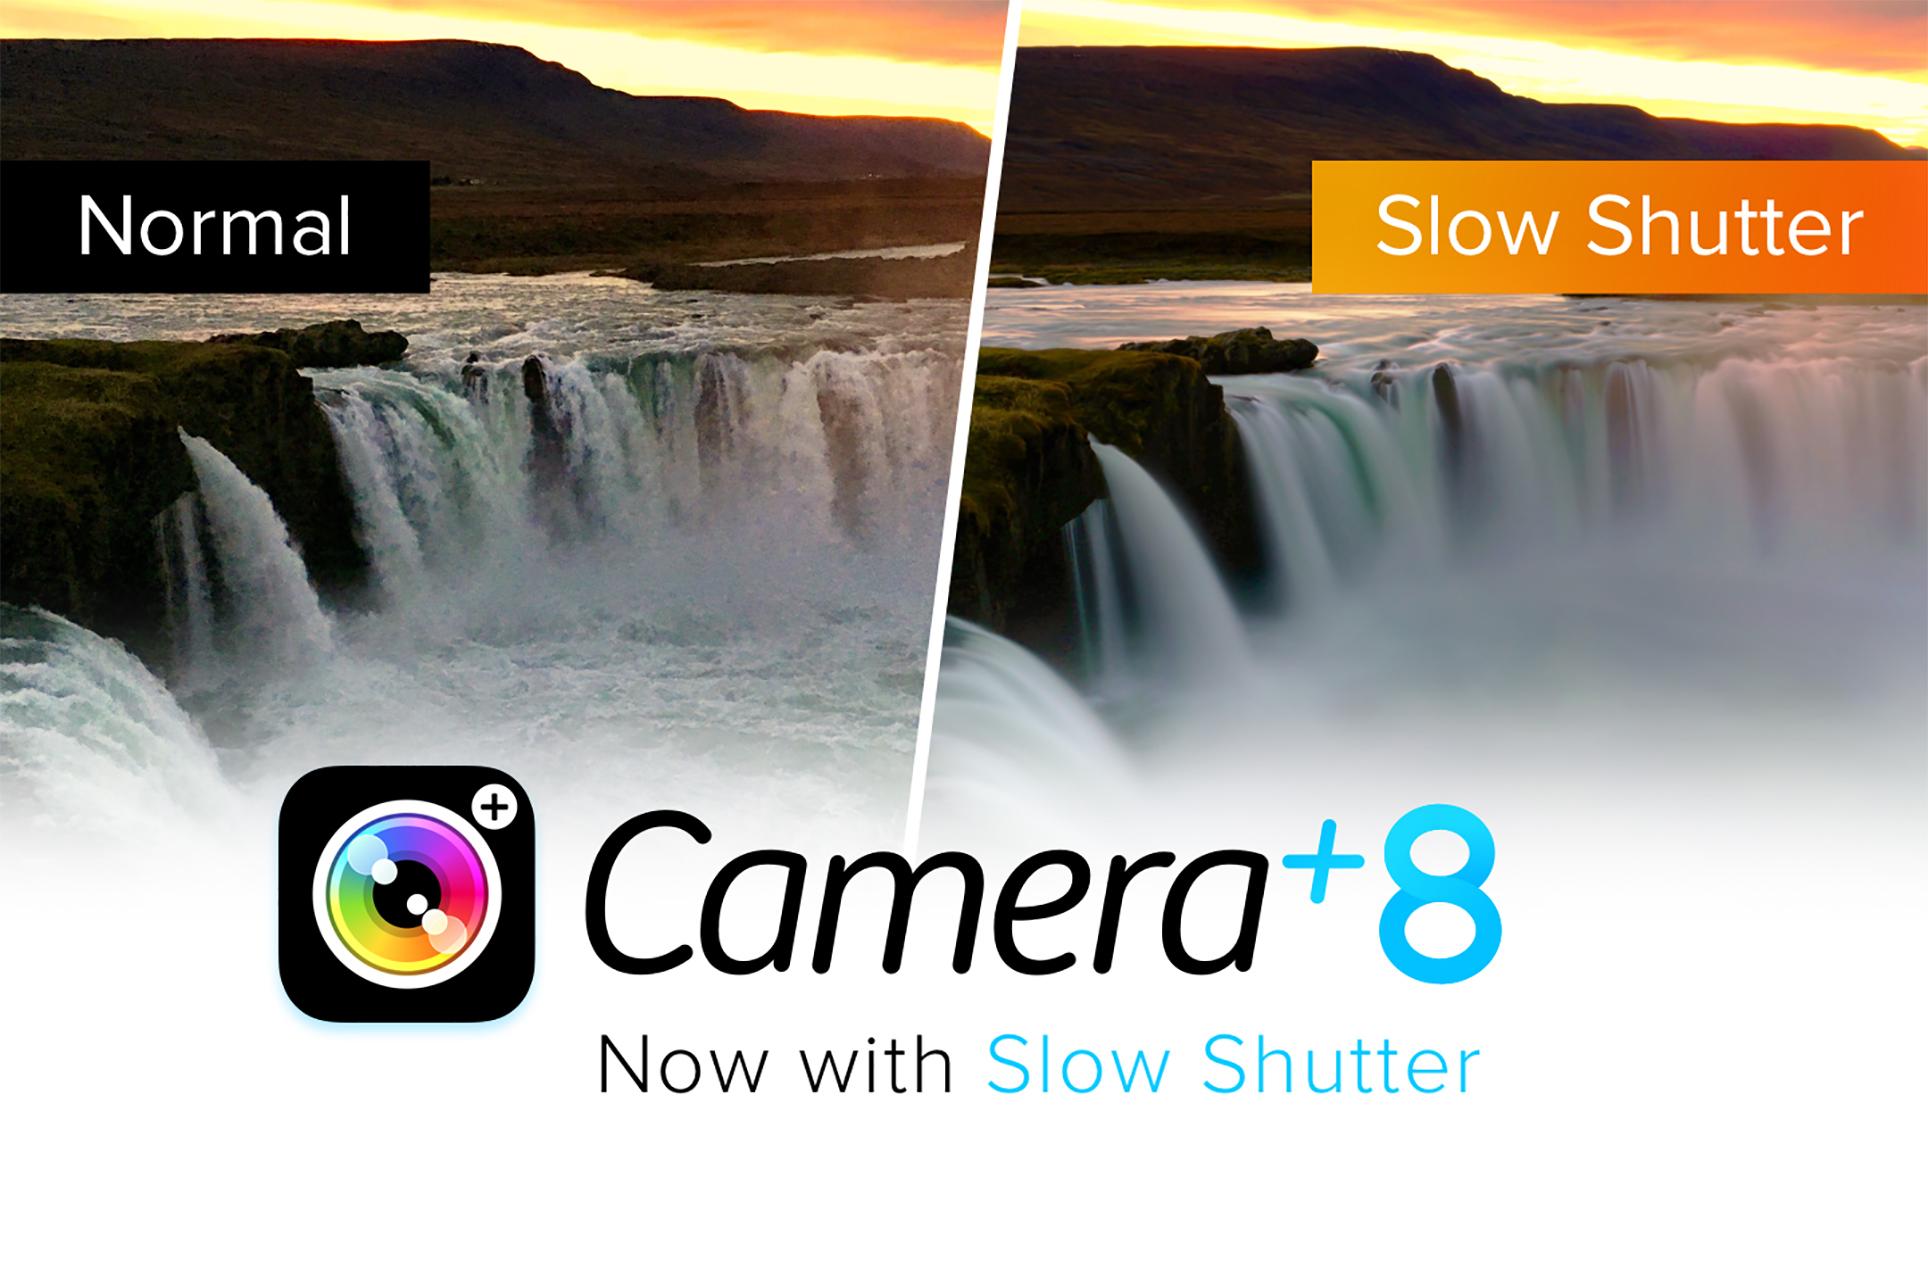 Camera+ 8